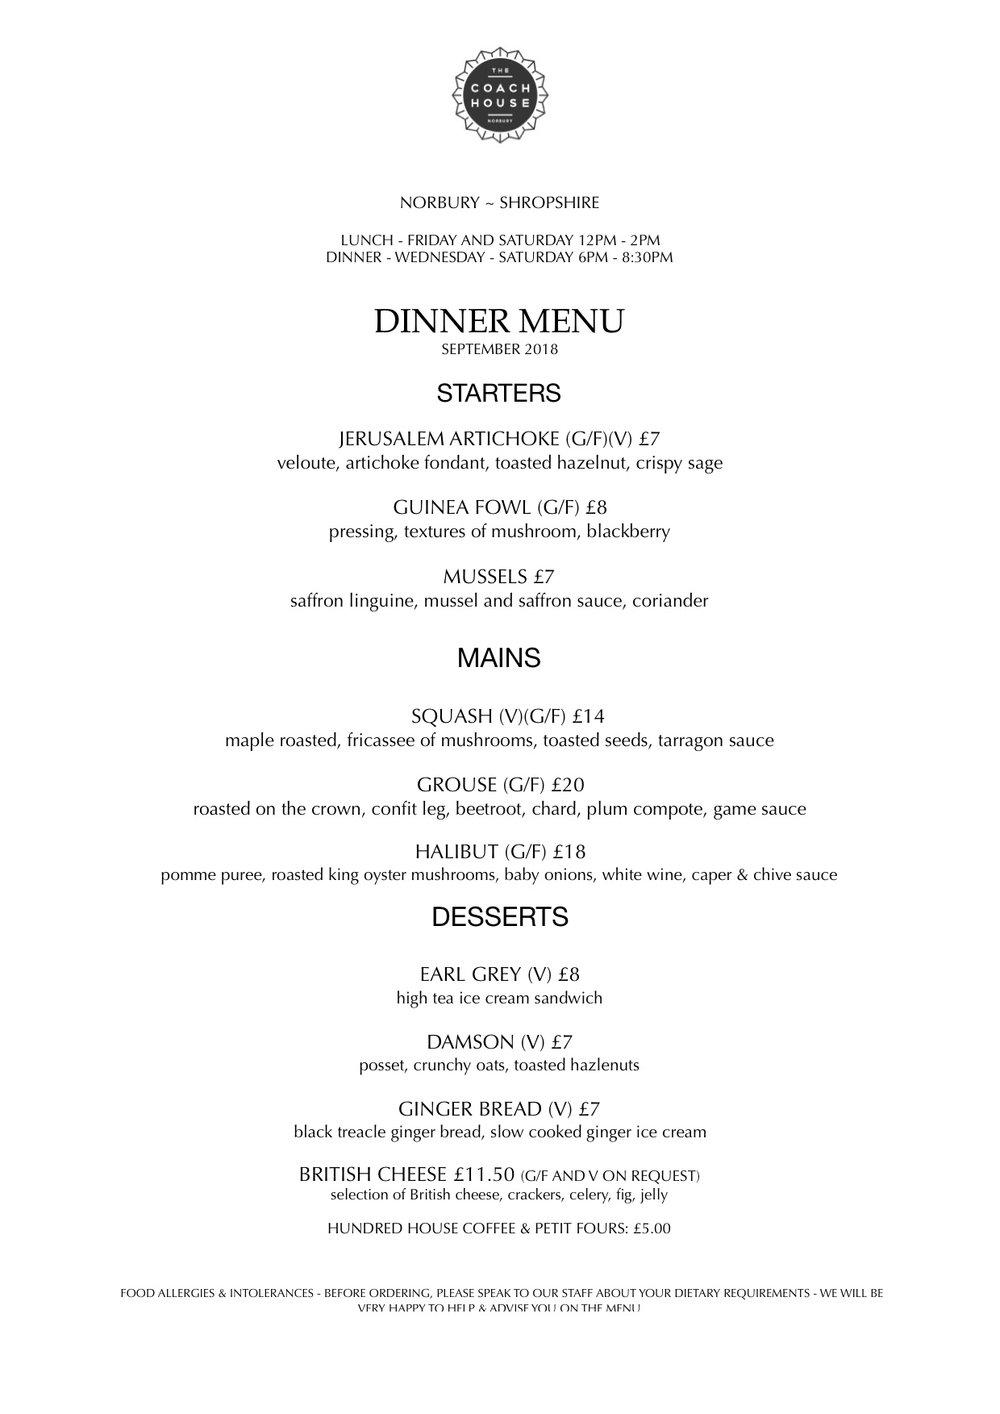 september_dinner_menu_coachhousenorbury.jpeg